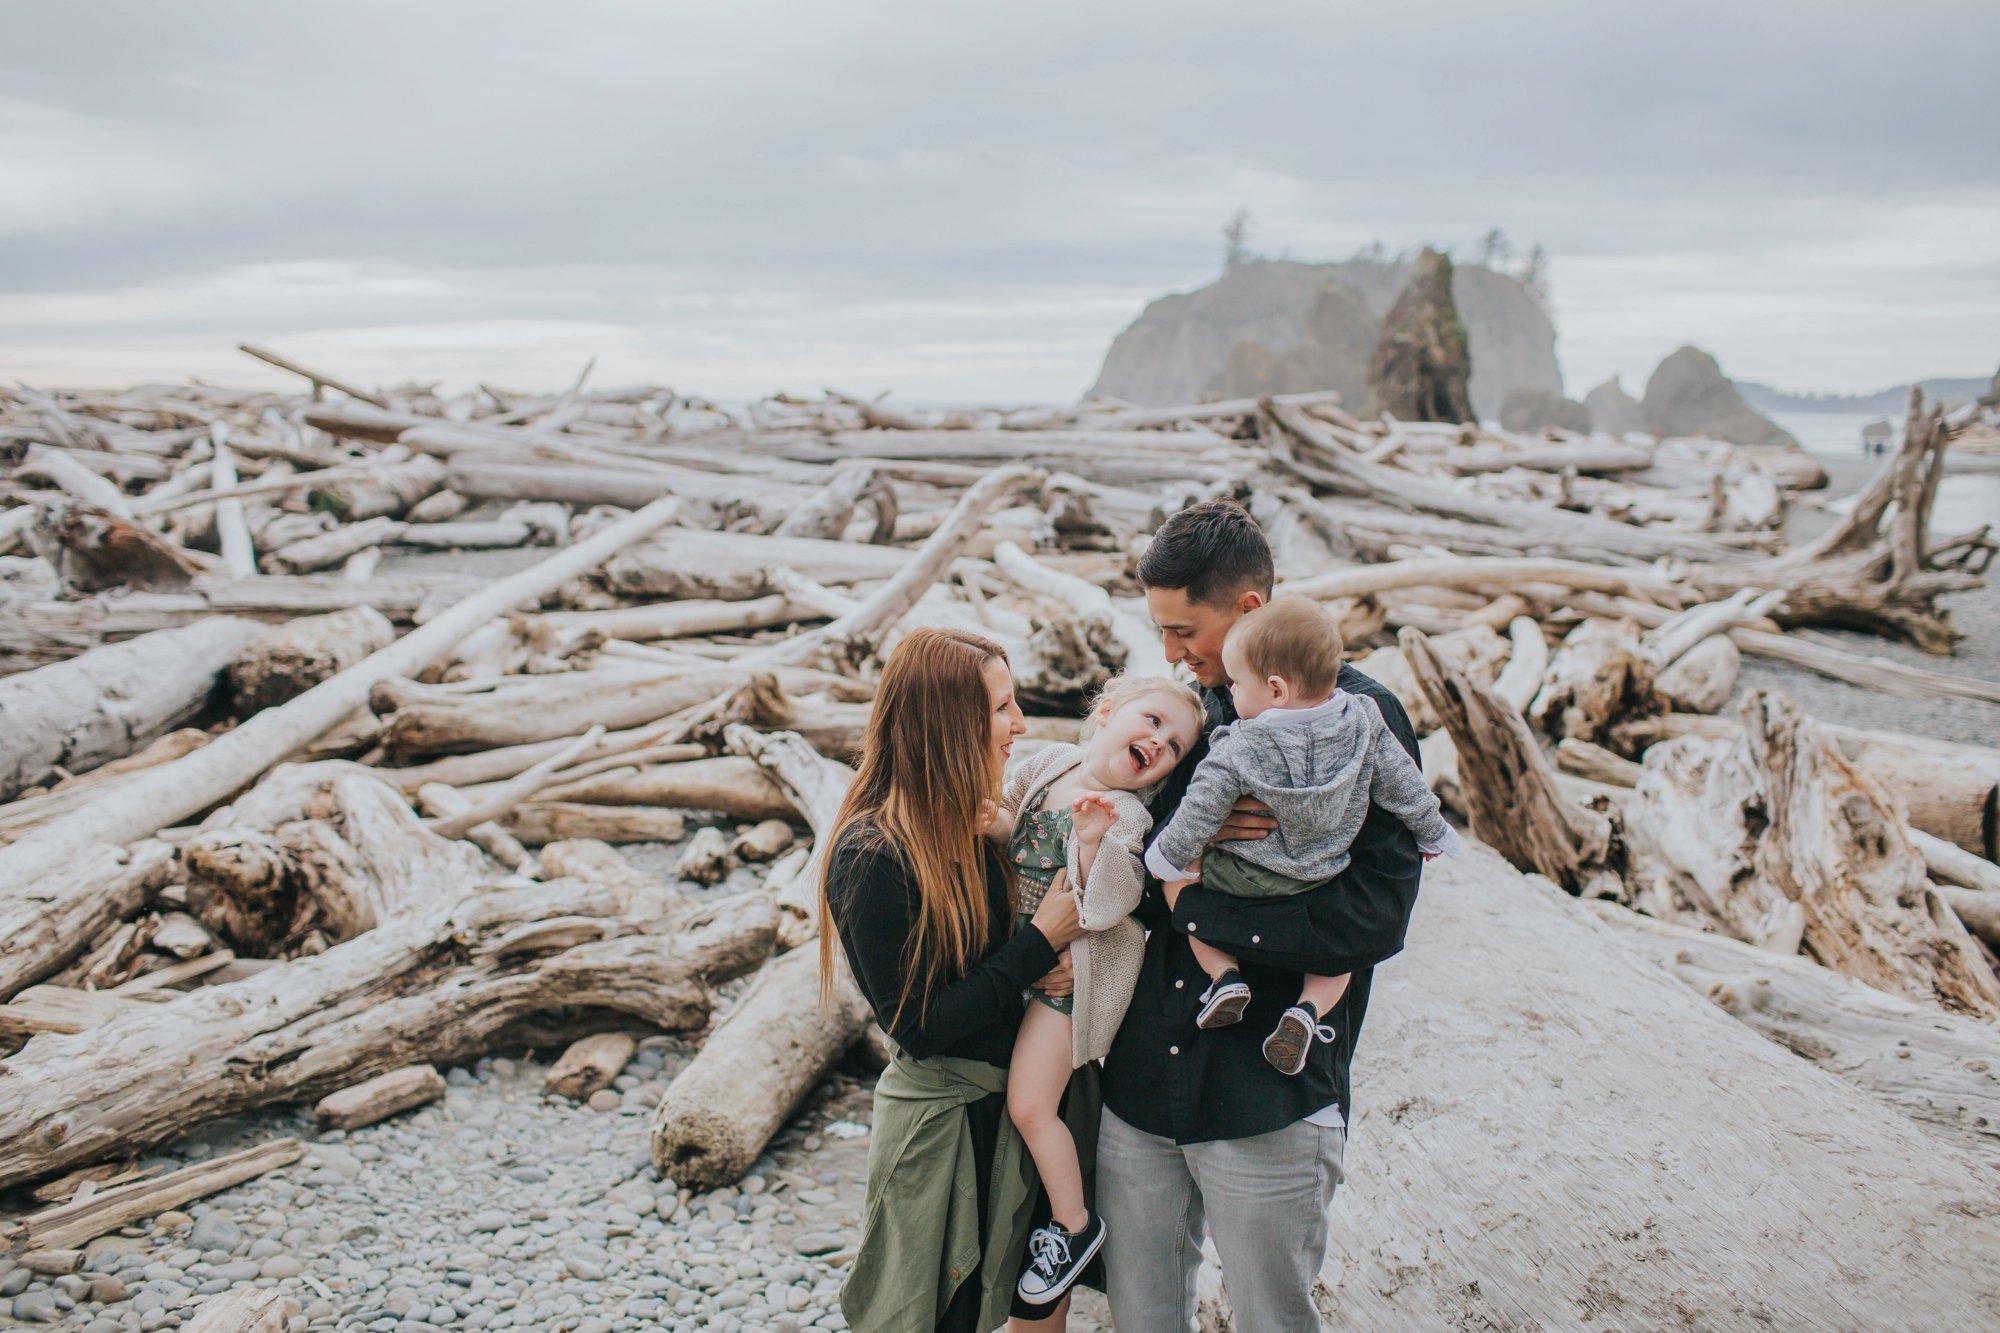 leanne rose photography, ruby beach photographer